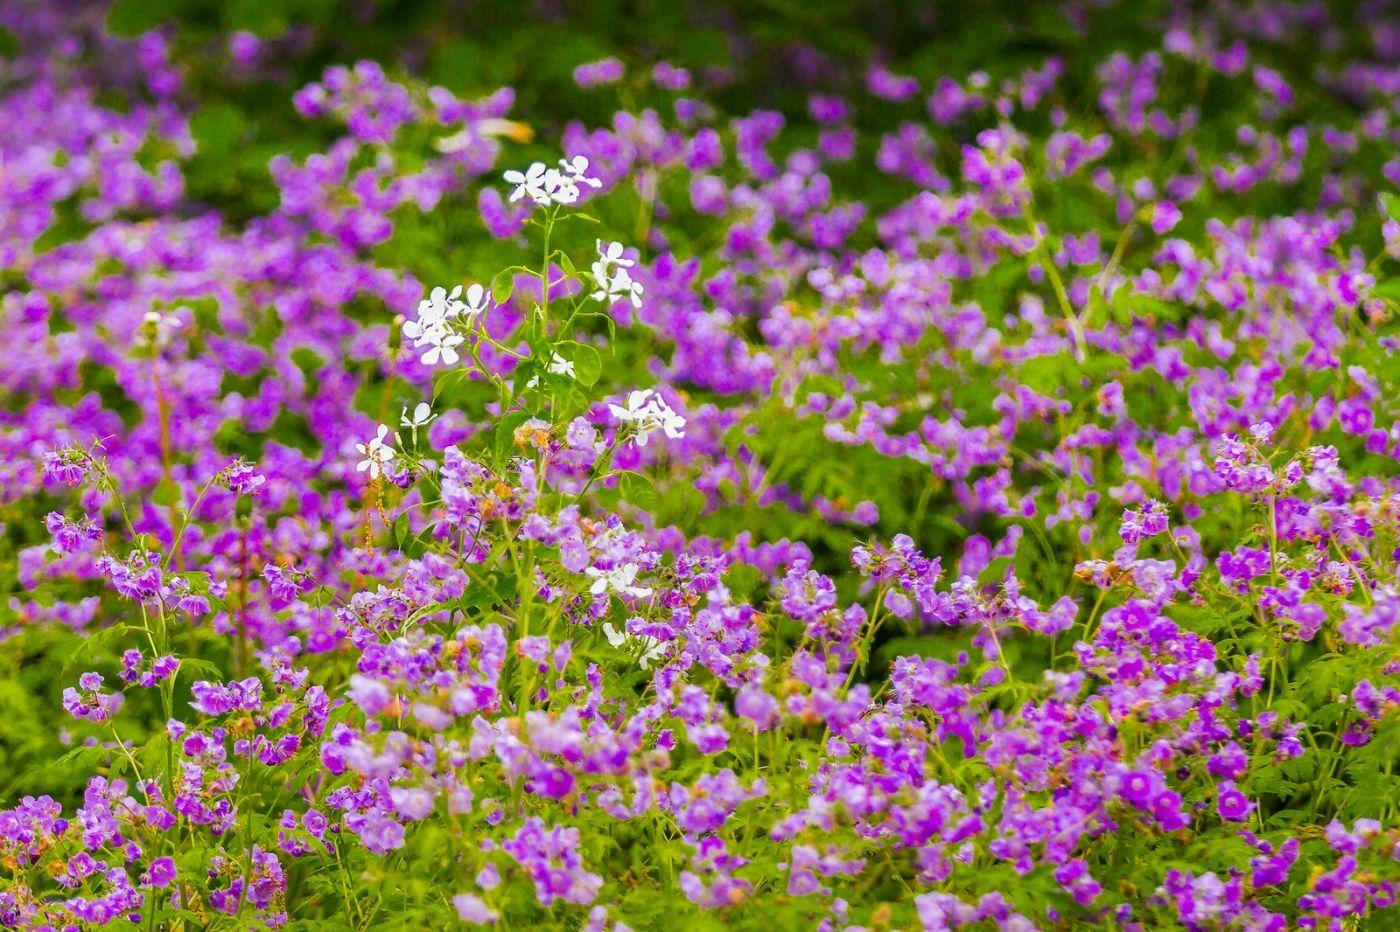 Chanticleer花园,有梦想的季节_图1-23